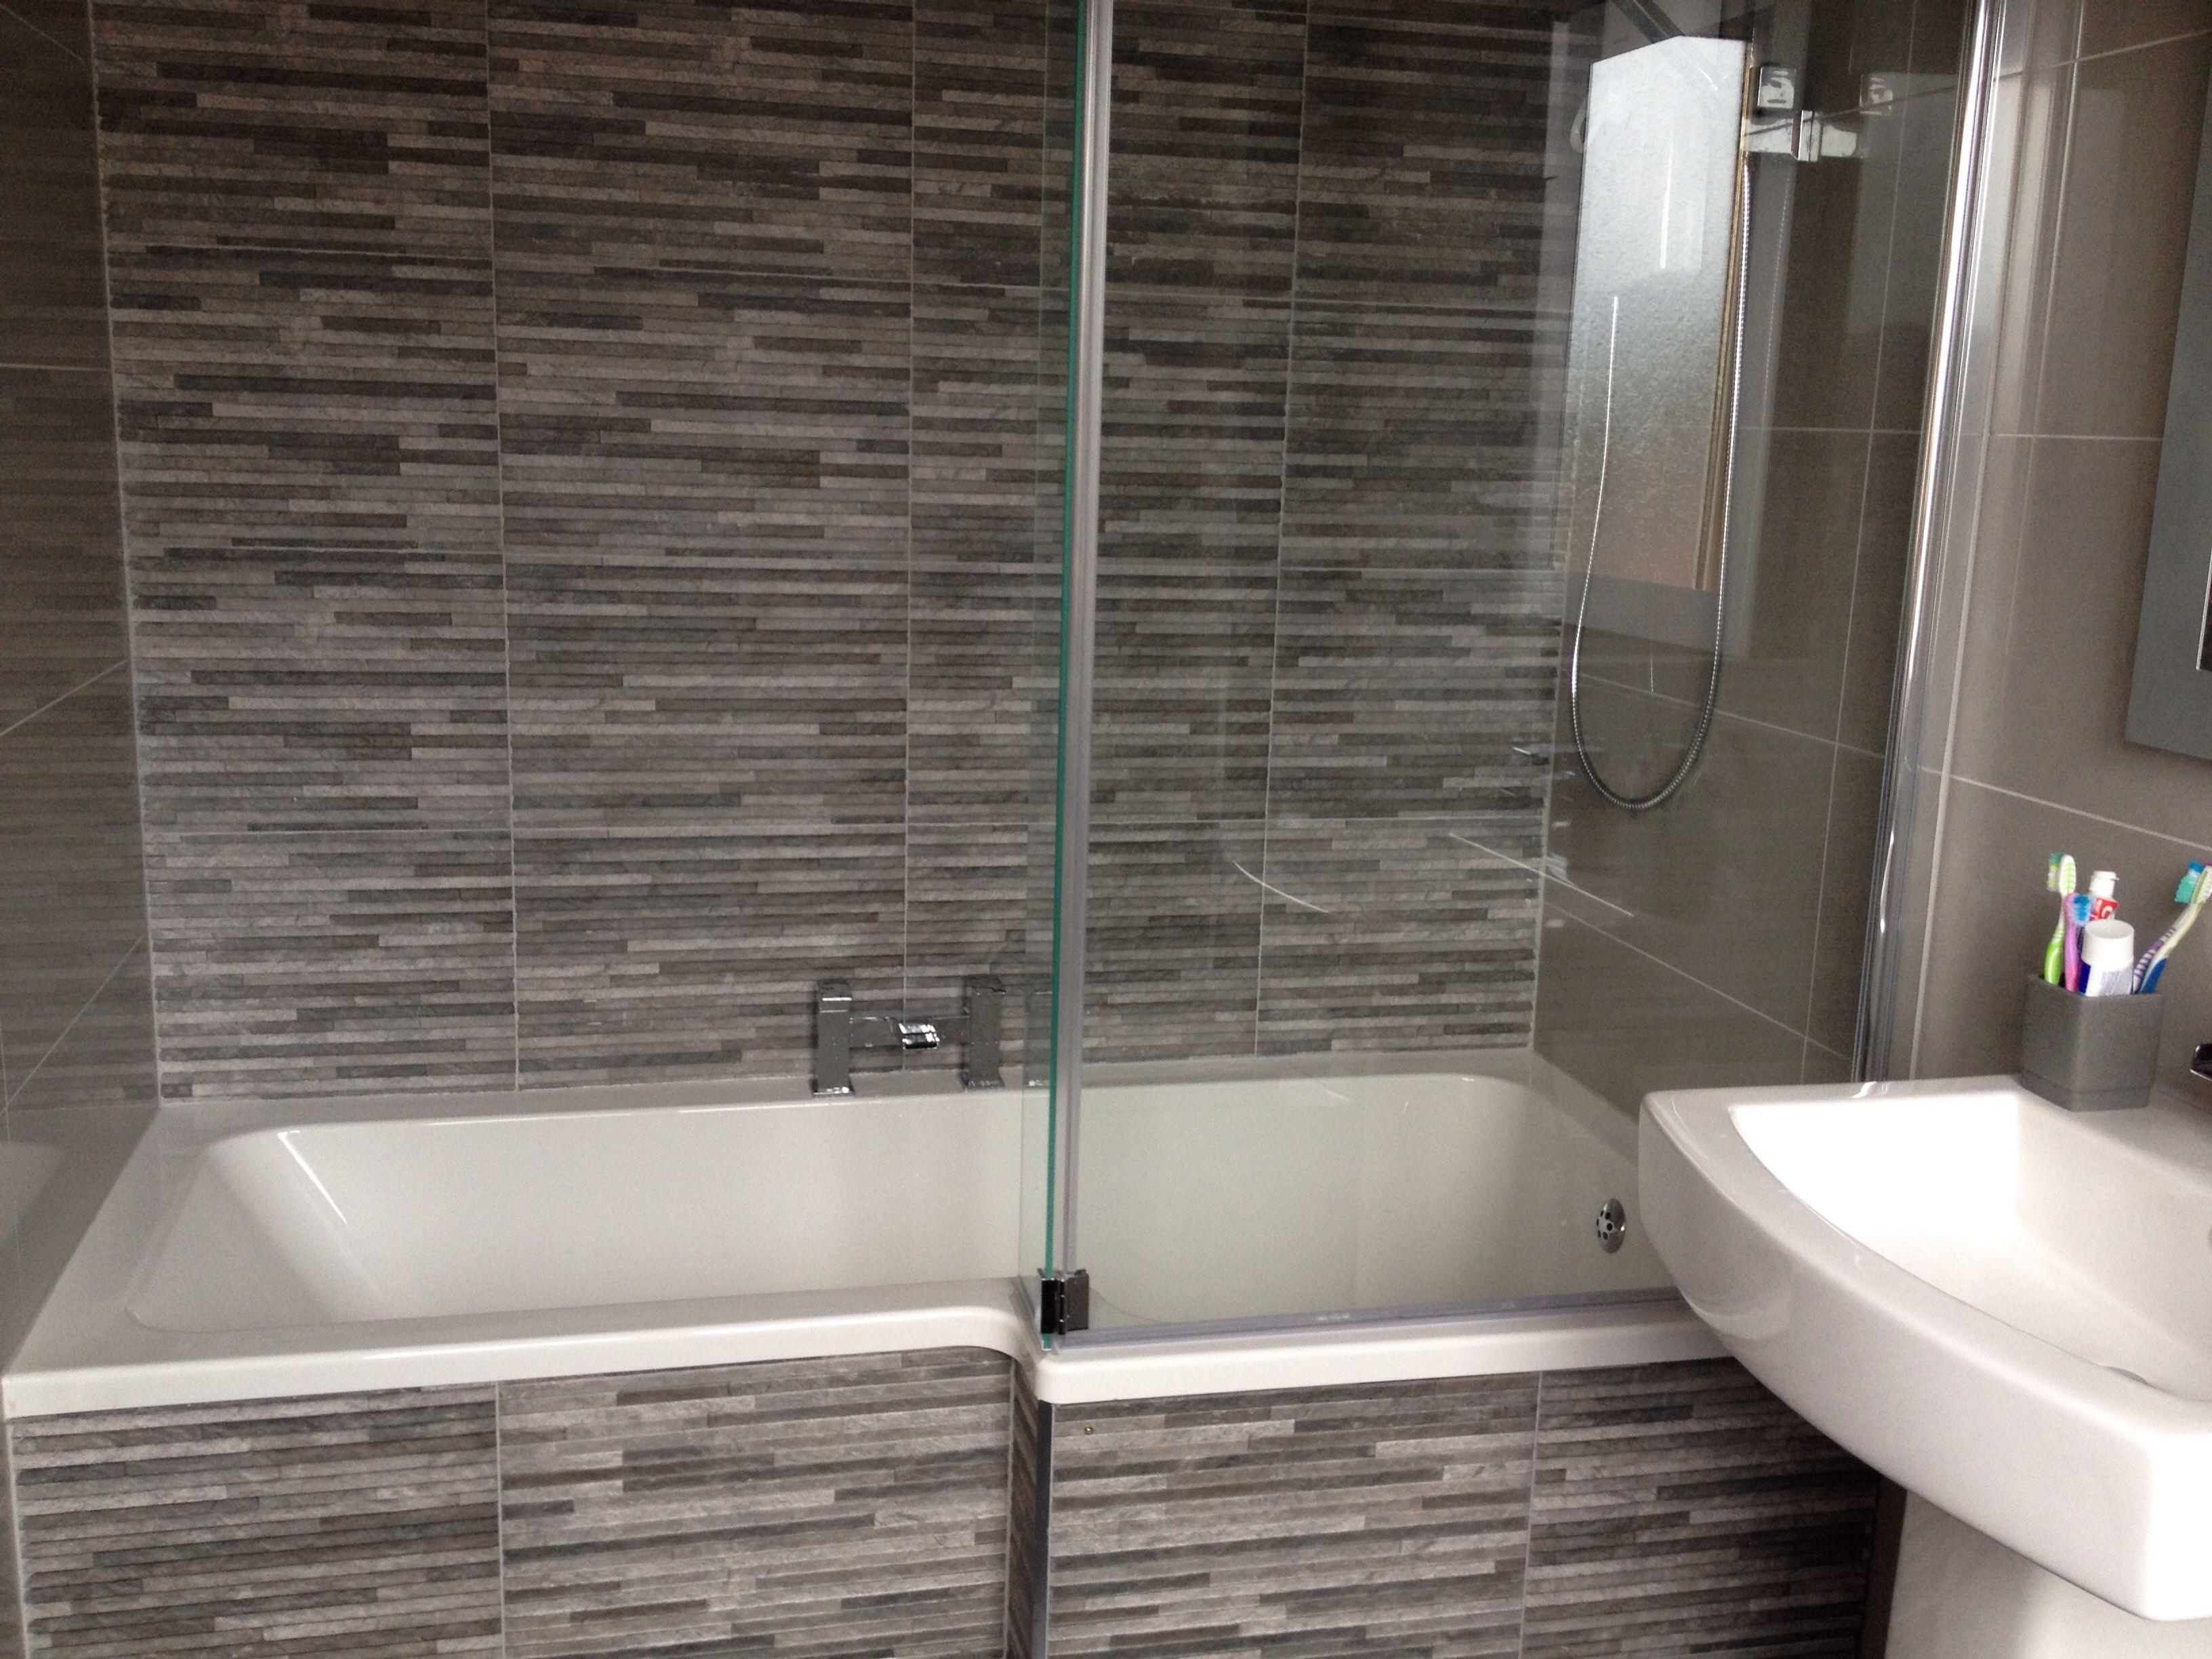 L Shaped Bath, Screen & Tiles | L Shaped Bath, Bathroom Design, Simple Bathroom